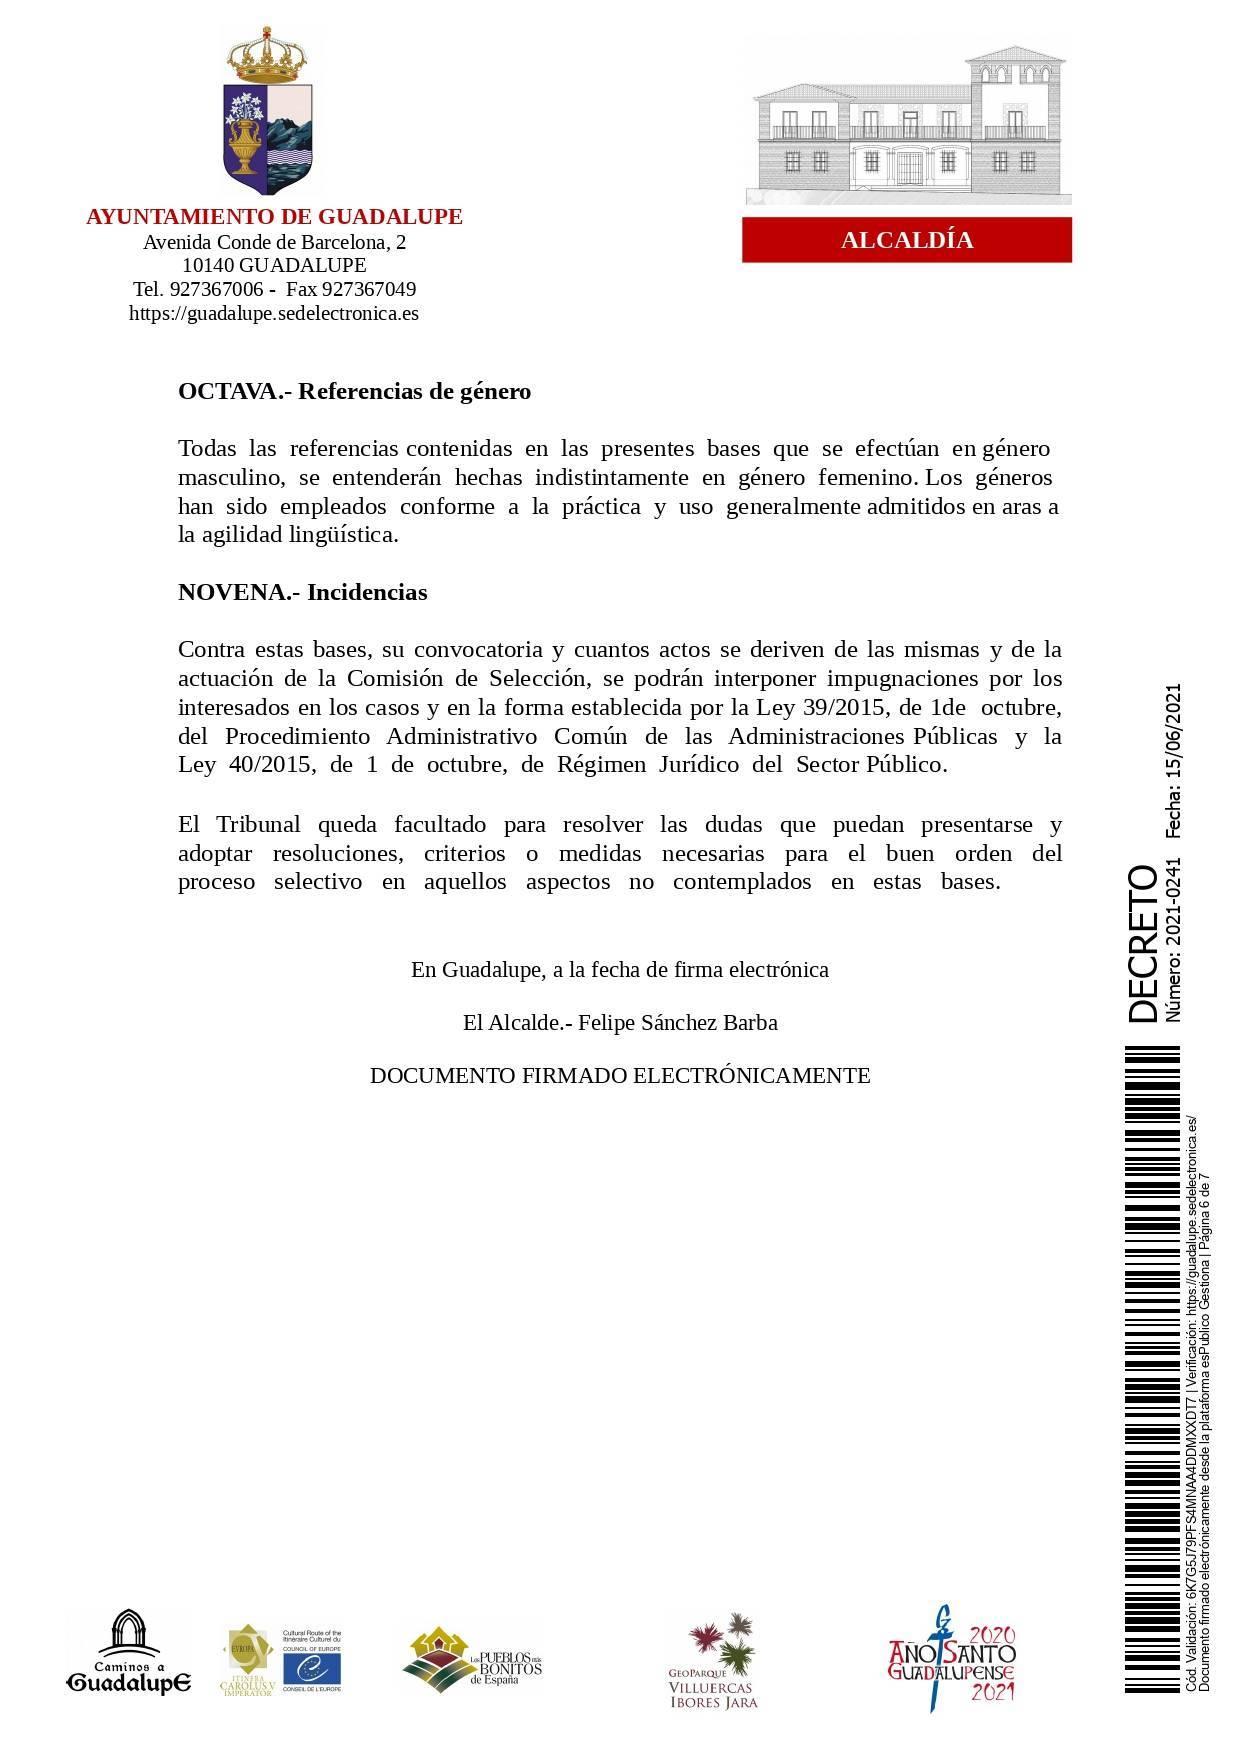 Bolsa de conductores-operarios de recogida de RSU (2021) - Guadalupe (Cáceres) 6